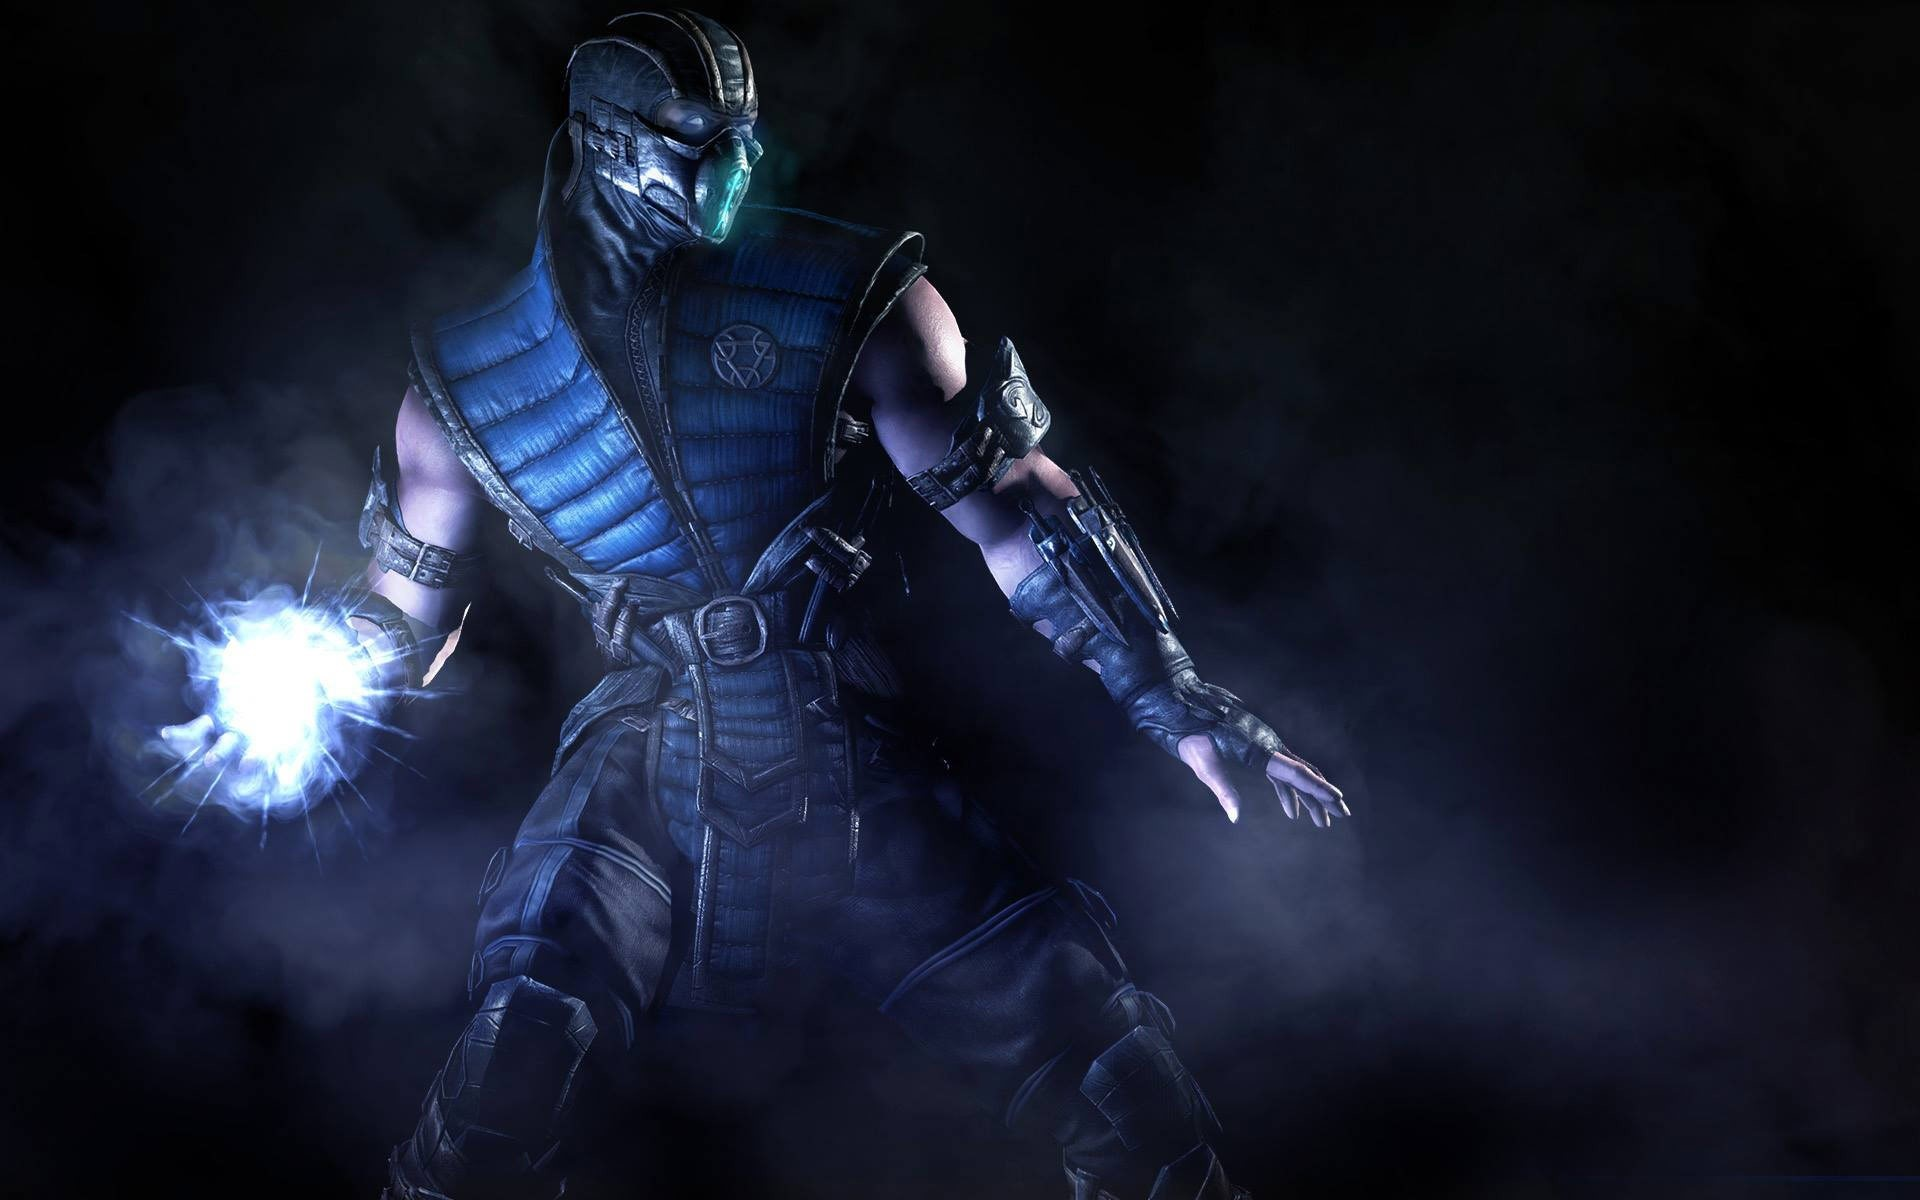 Wallpaper Sub Zero of Mortal Kombat X